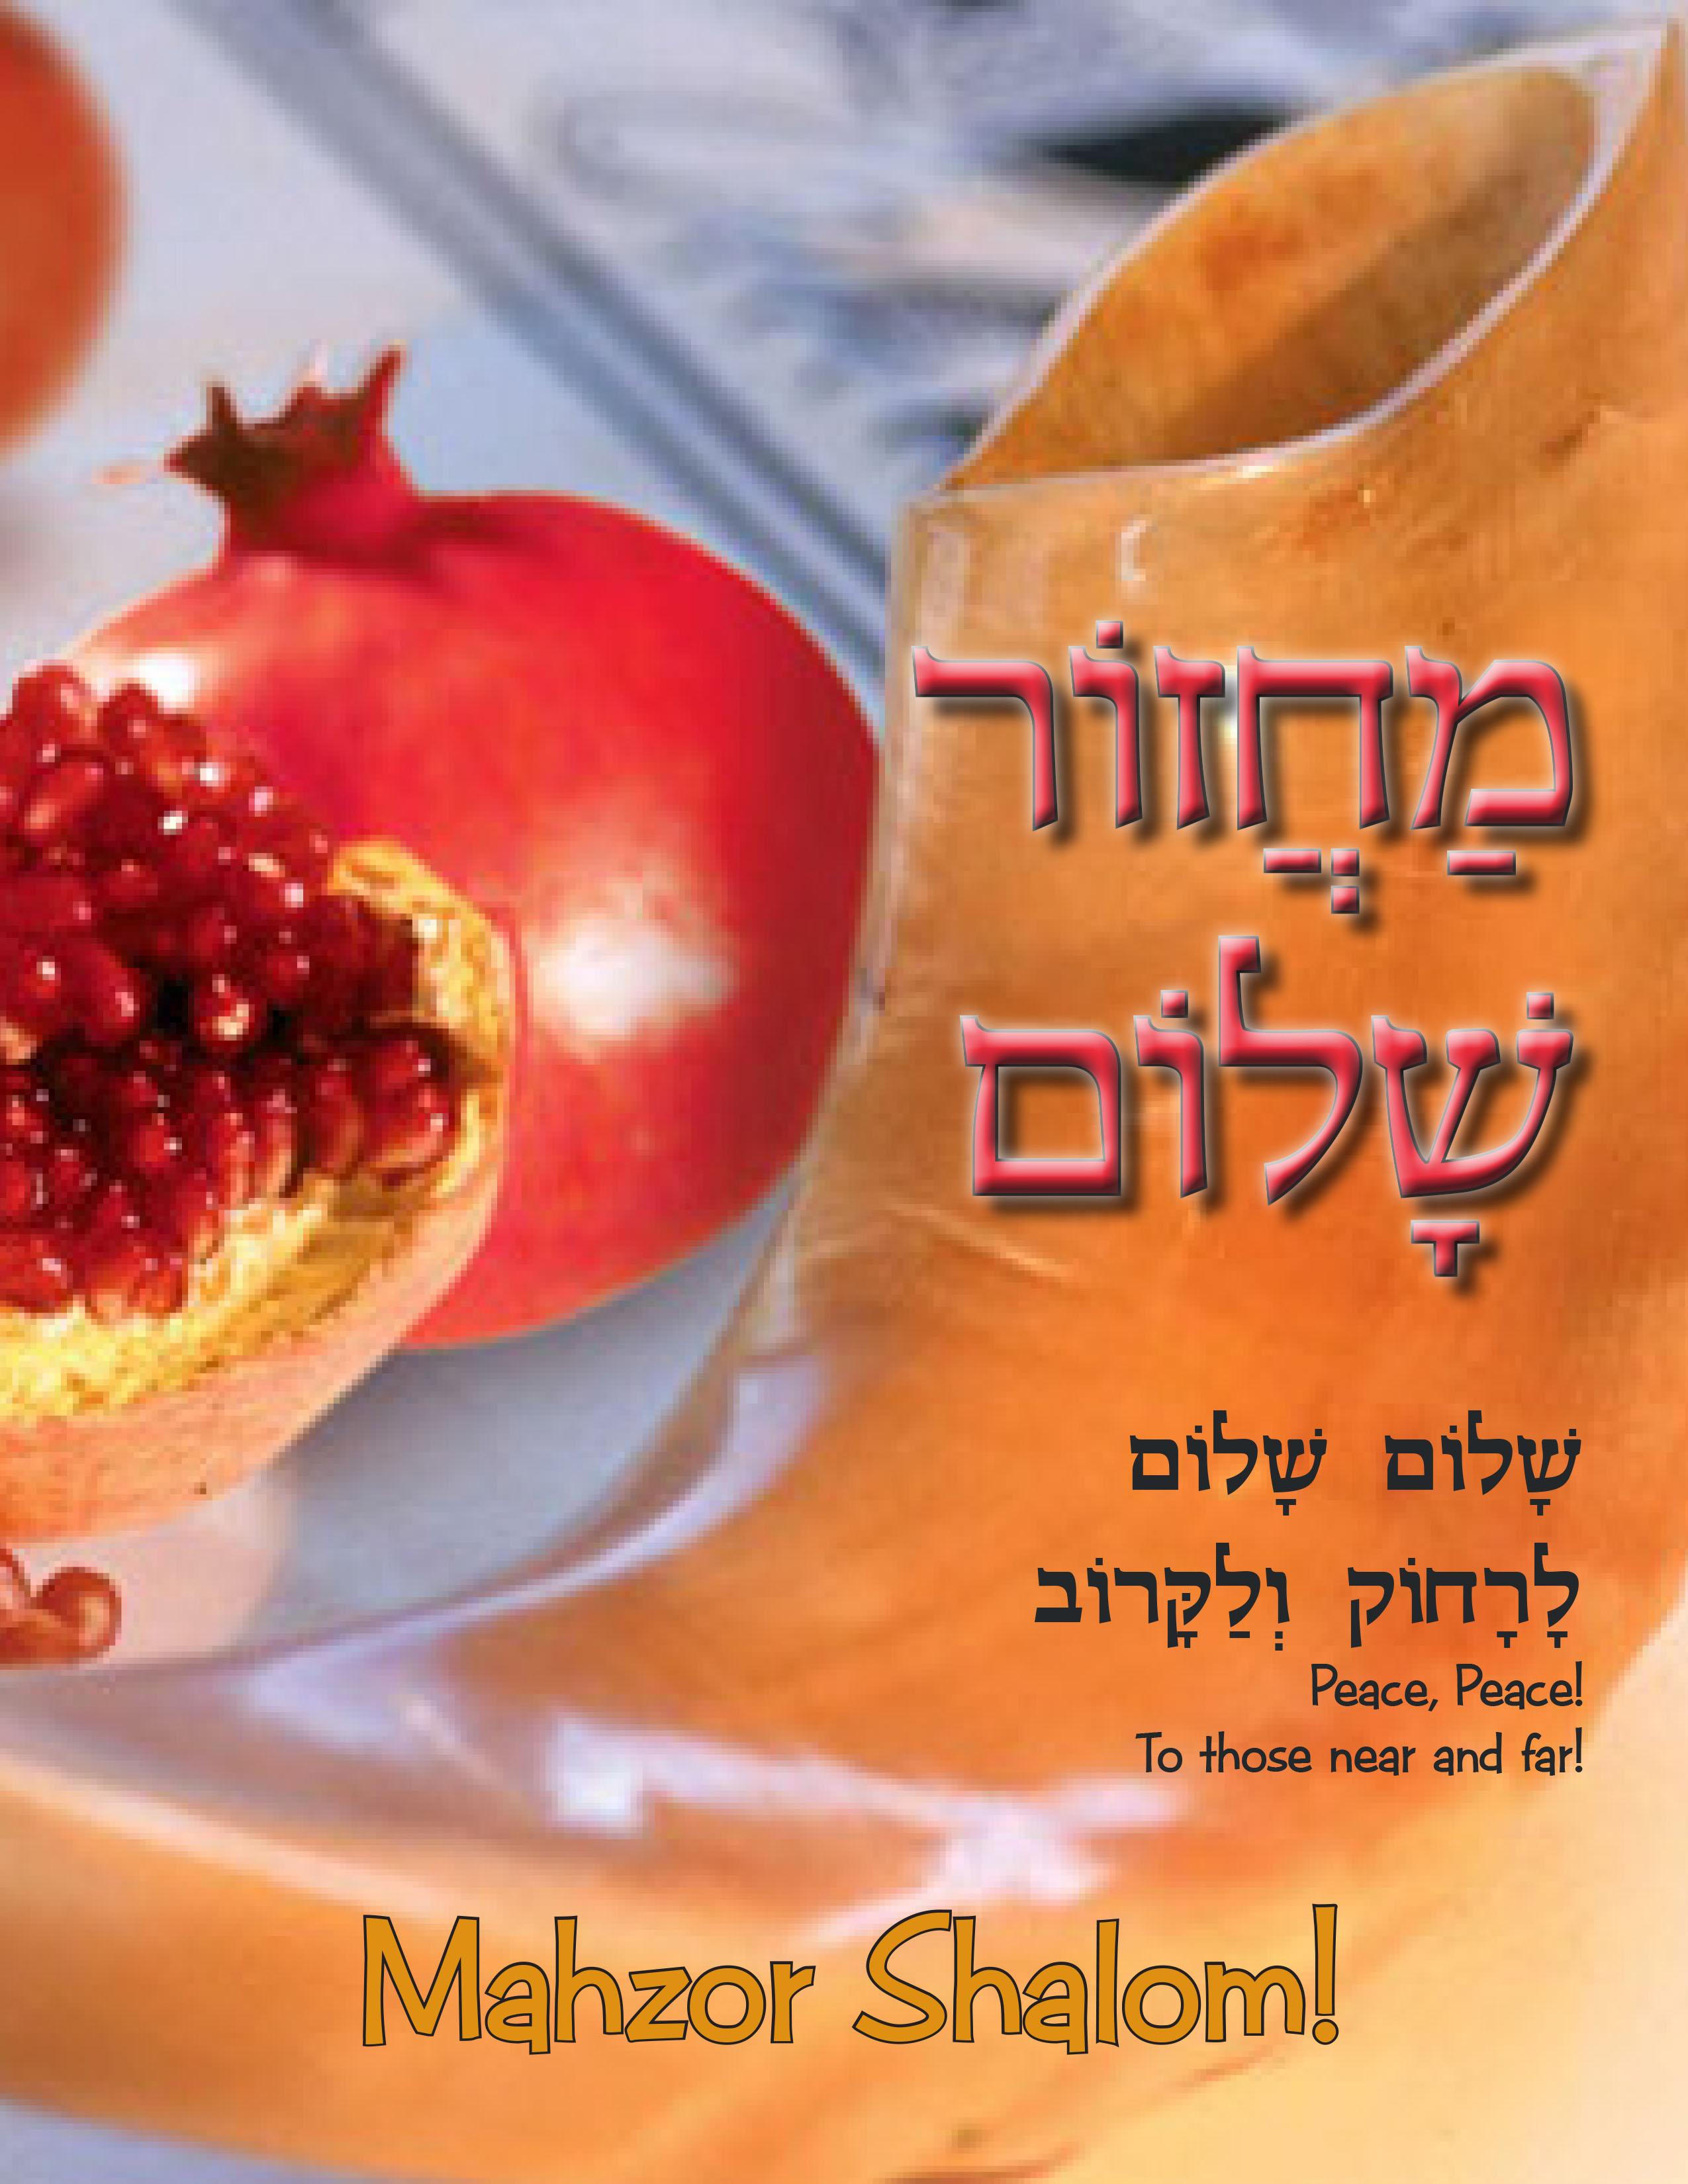 Mahzor Sholom Student Edition